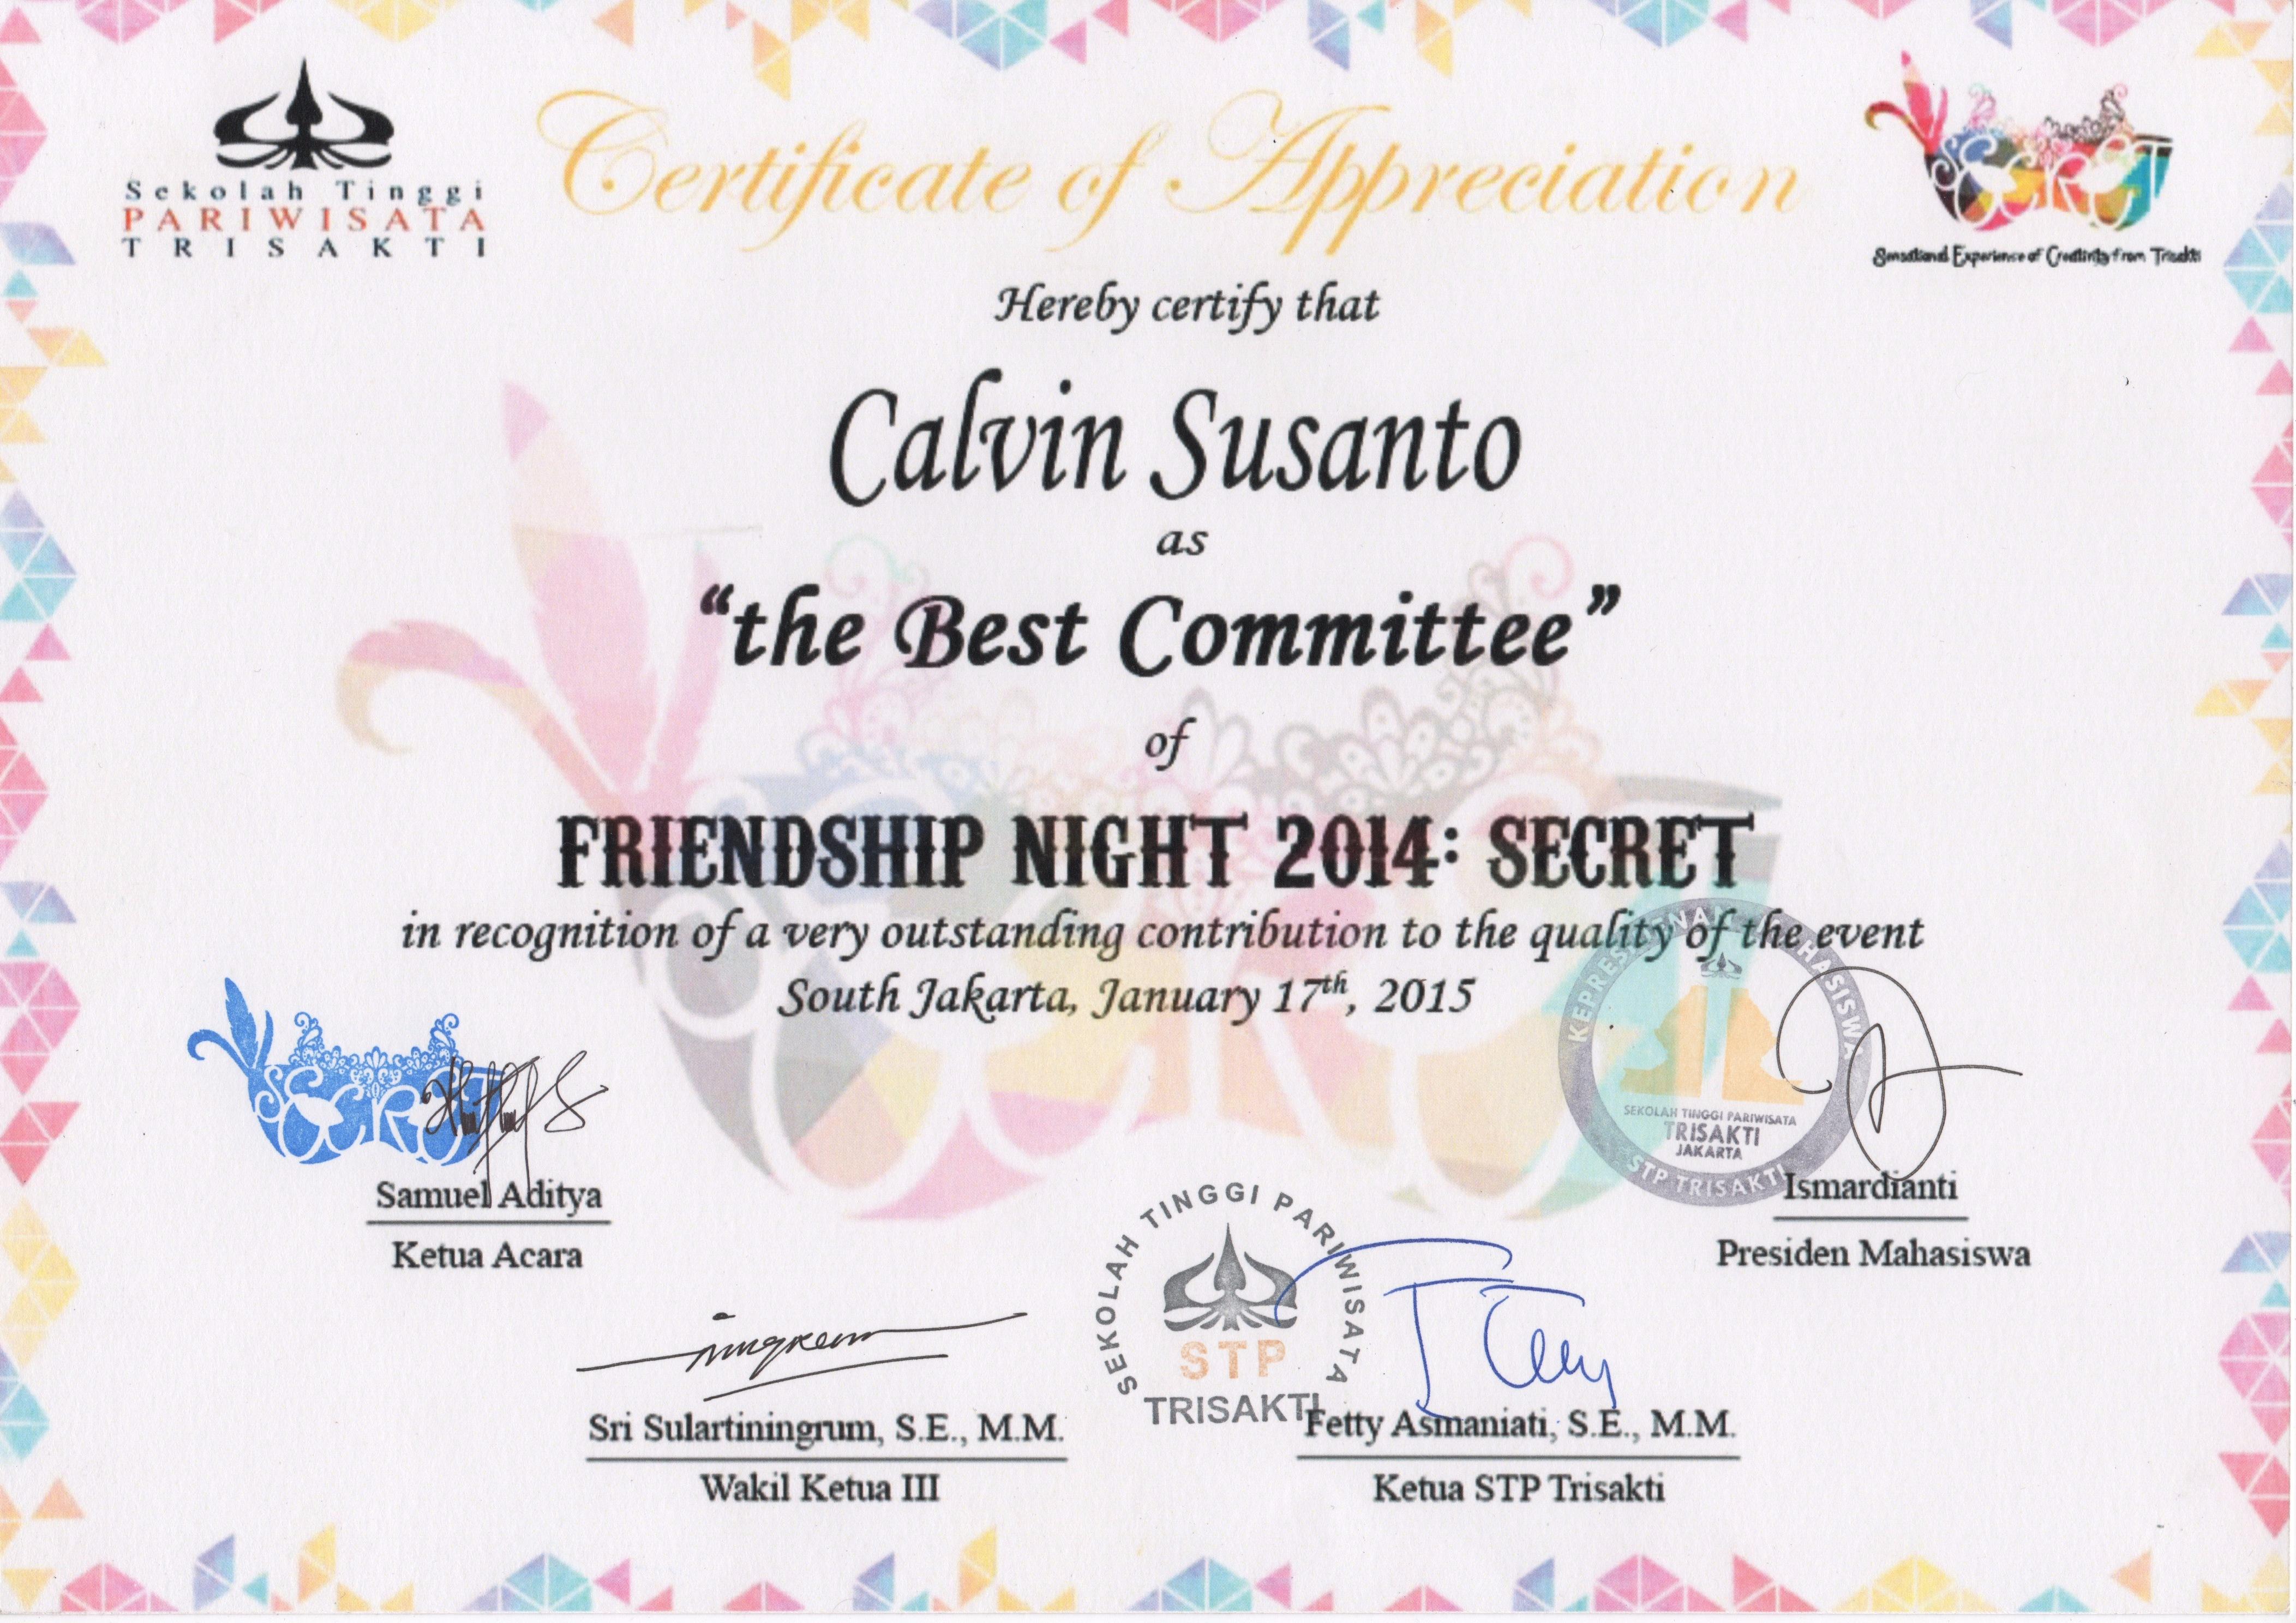 Certificate of Appreciation The Best Committee Friendship Night 2014 SECRET - Calvin Susanto.jpeg